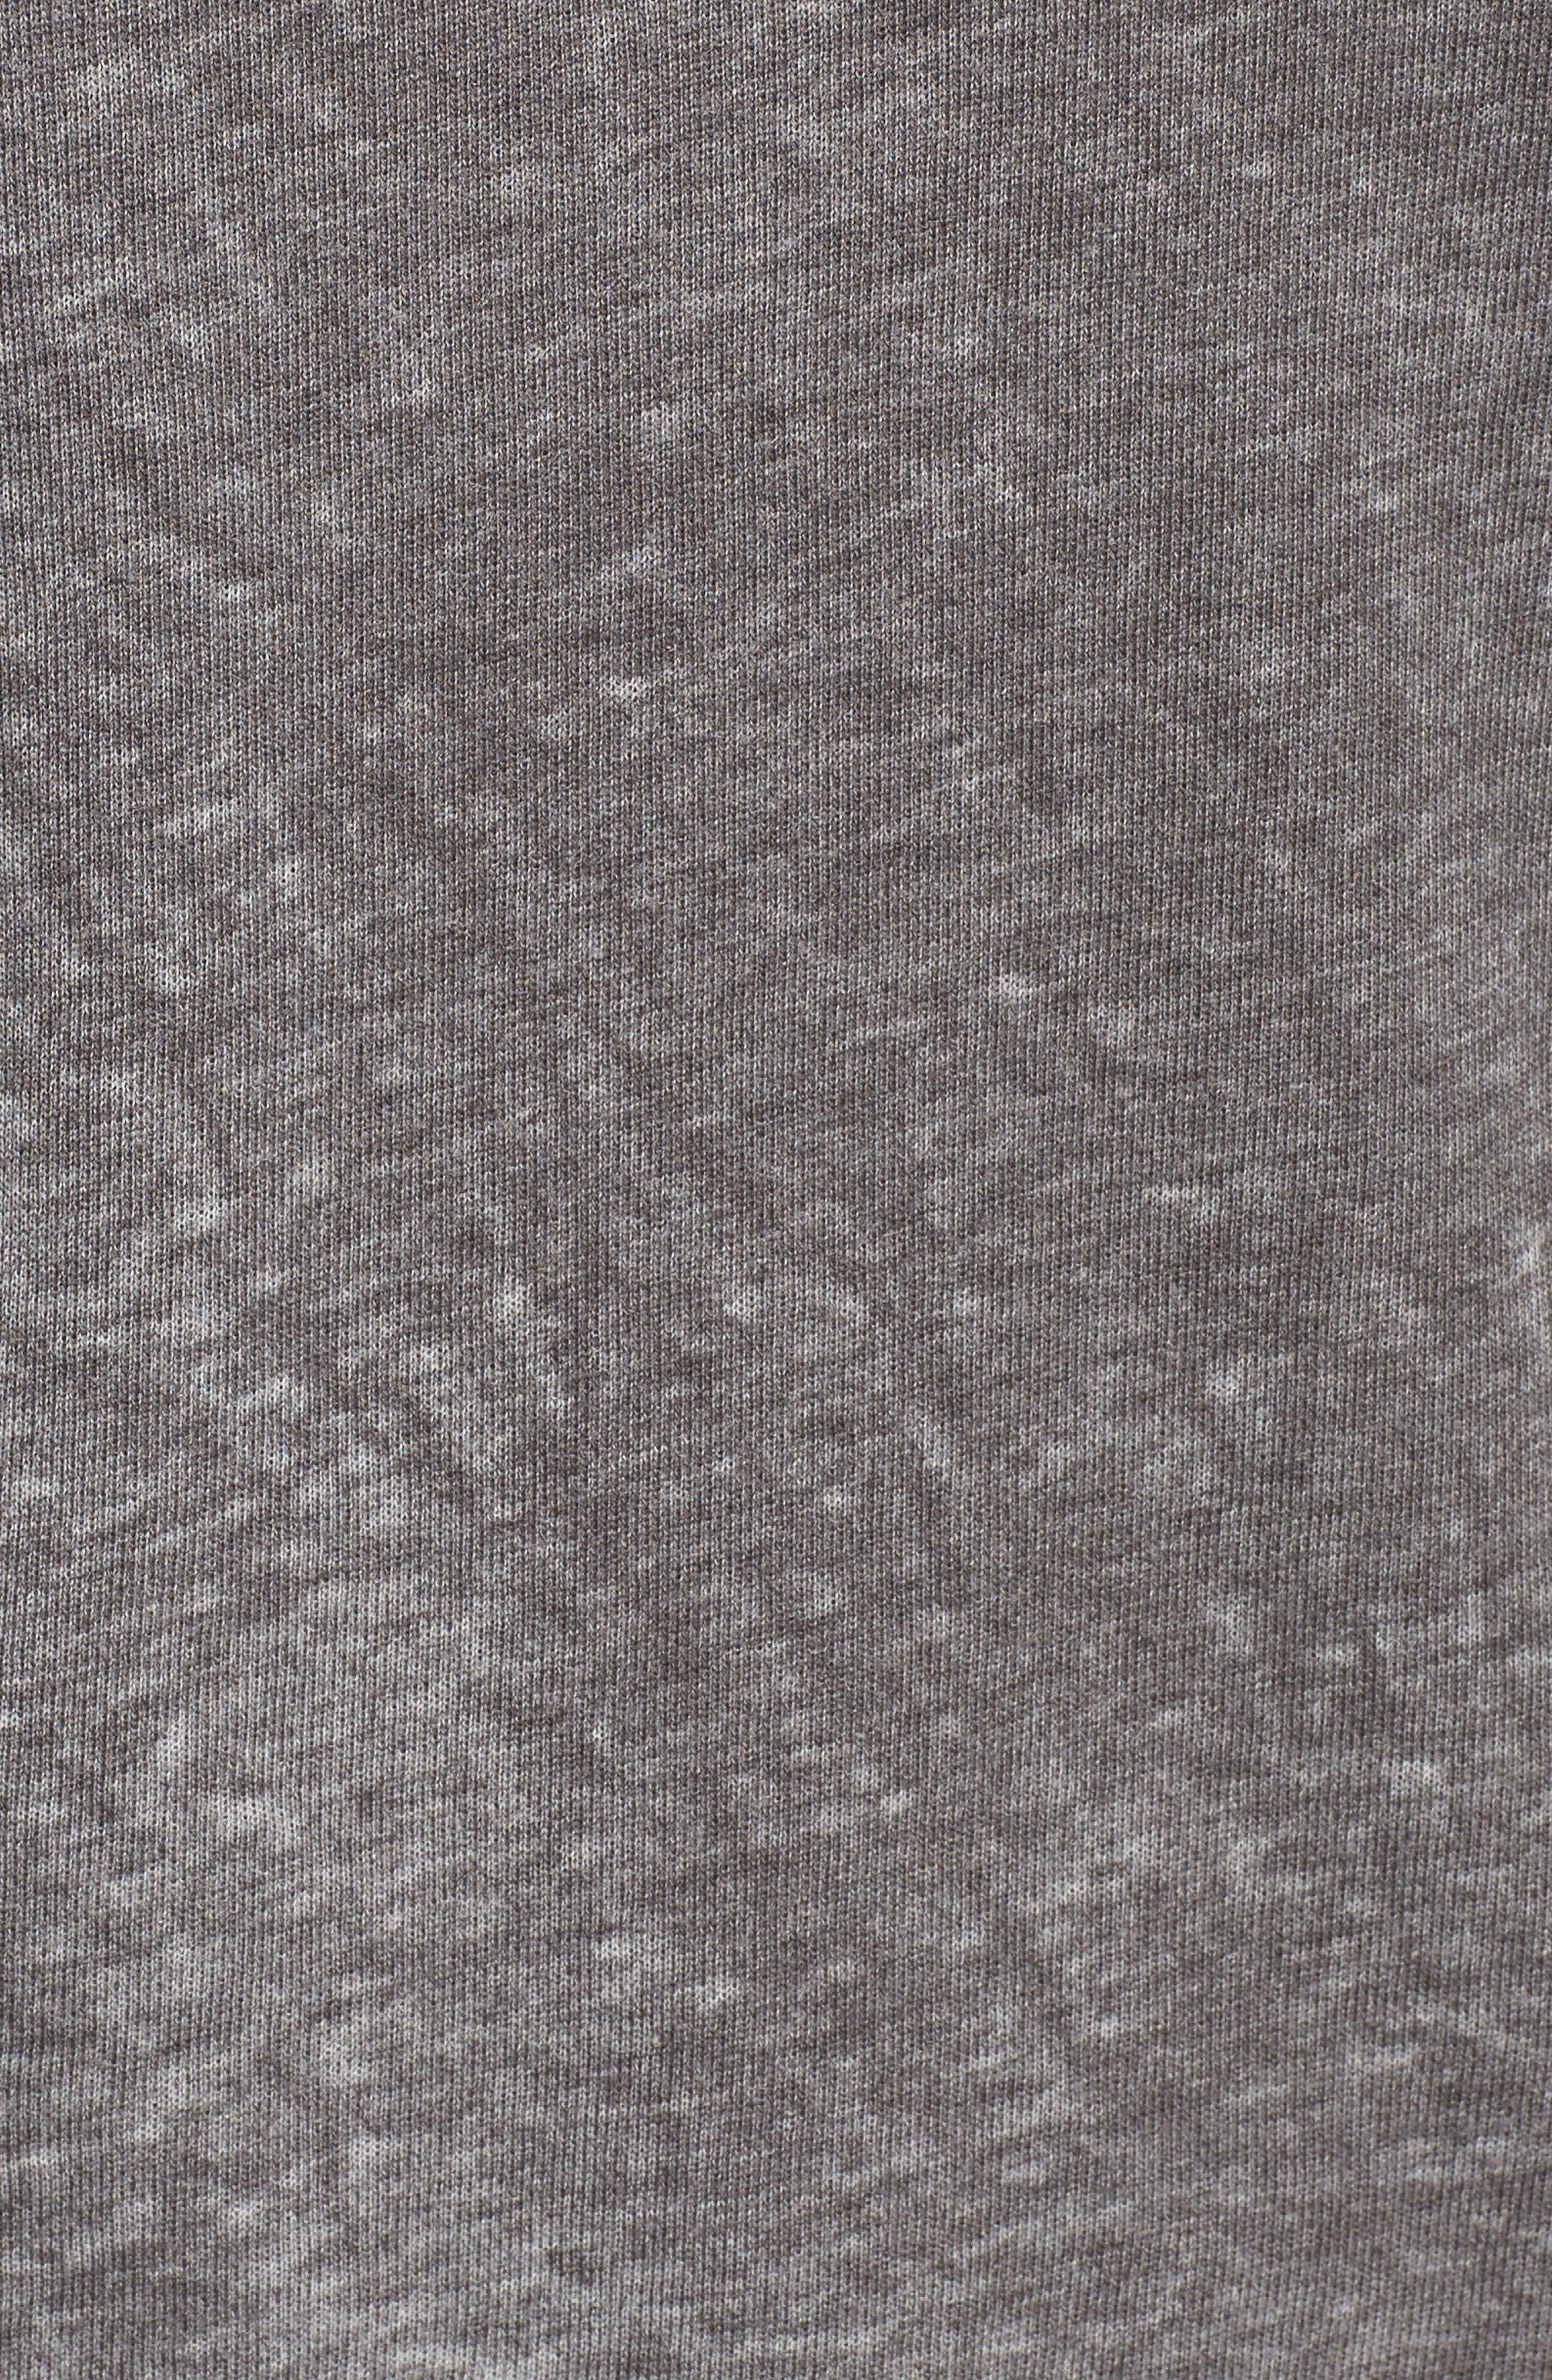 Alternate Image 5  - Junk Food Original Burnout Sweatshirt